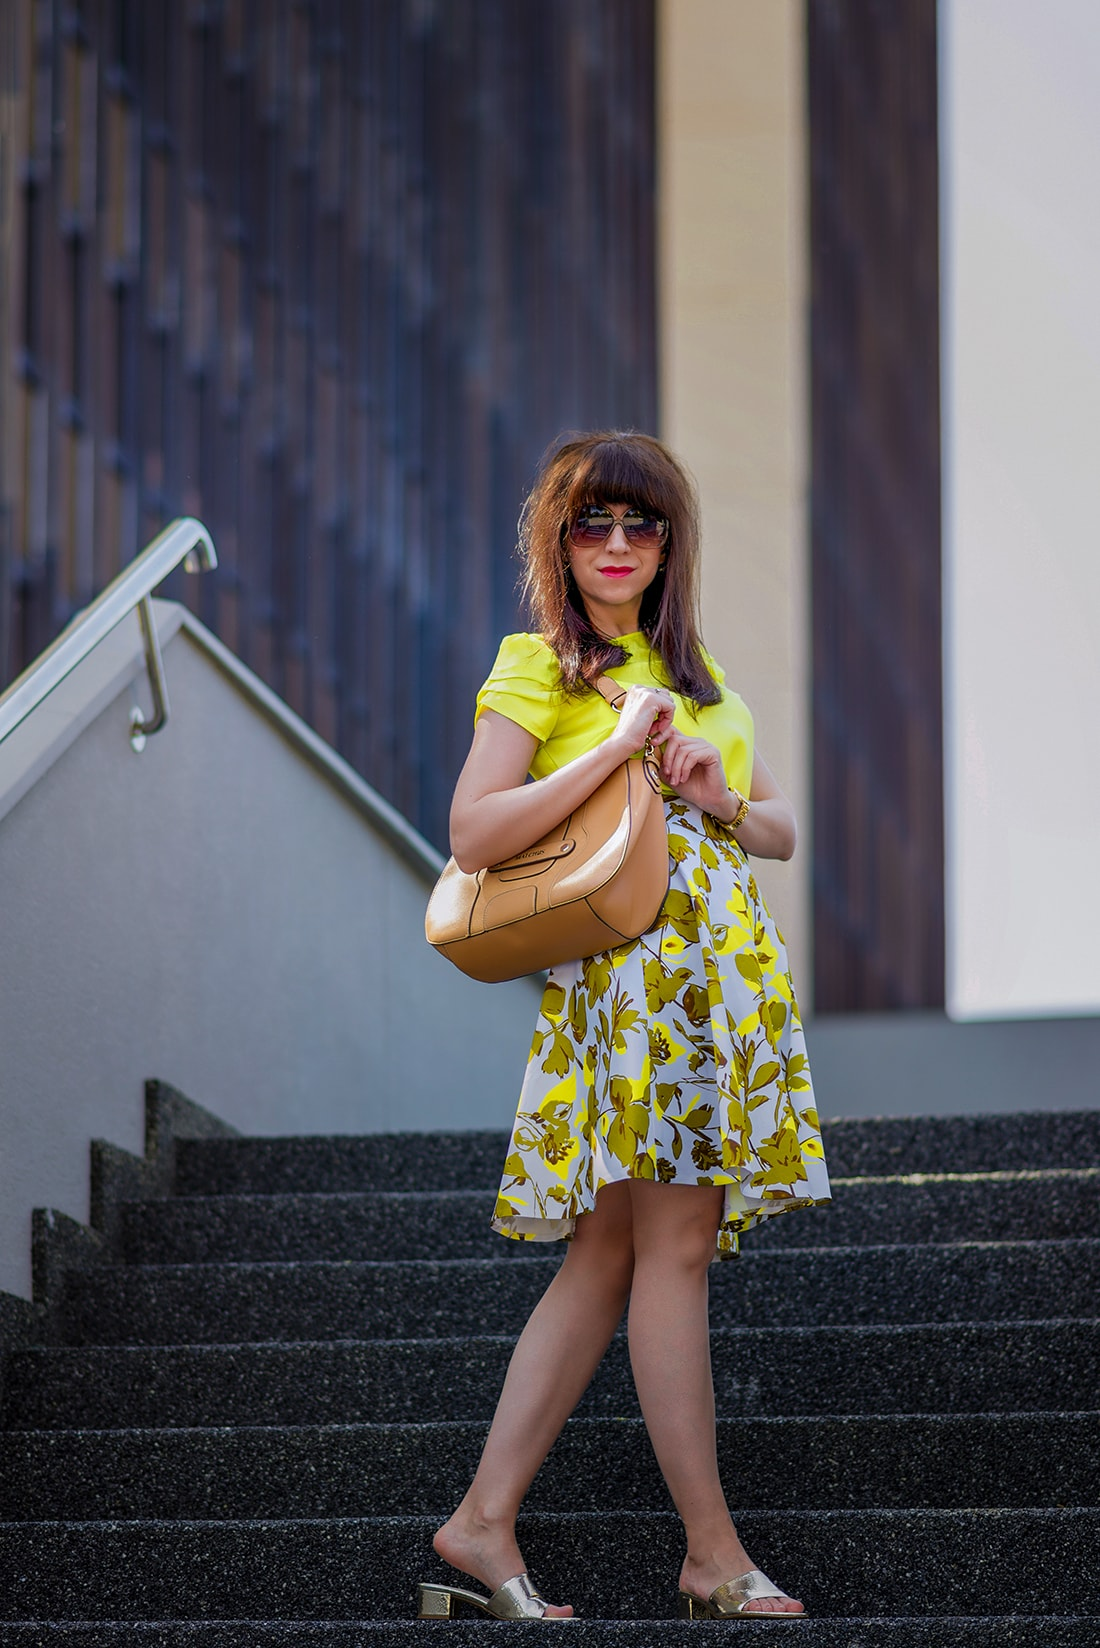 SUKŃA NA LETO OD MARGIFASHION_Katharine-fashion is beautiful_blog 1_Sukňa zelené kvety_Zlaté šľapky Sagan_Katarína Jakubčová_Fashion blogger